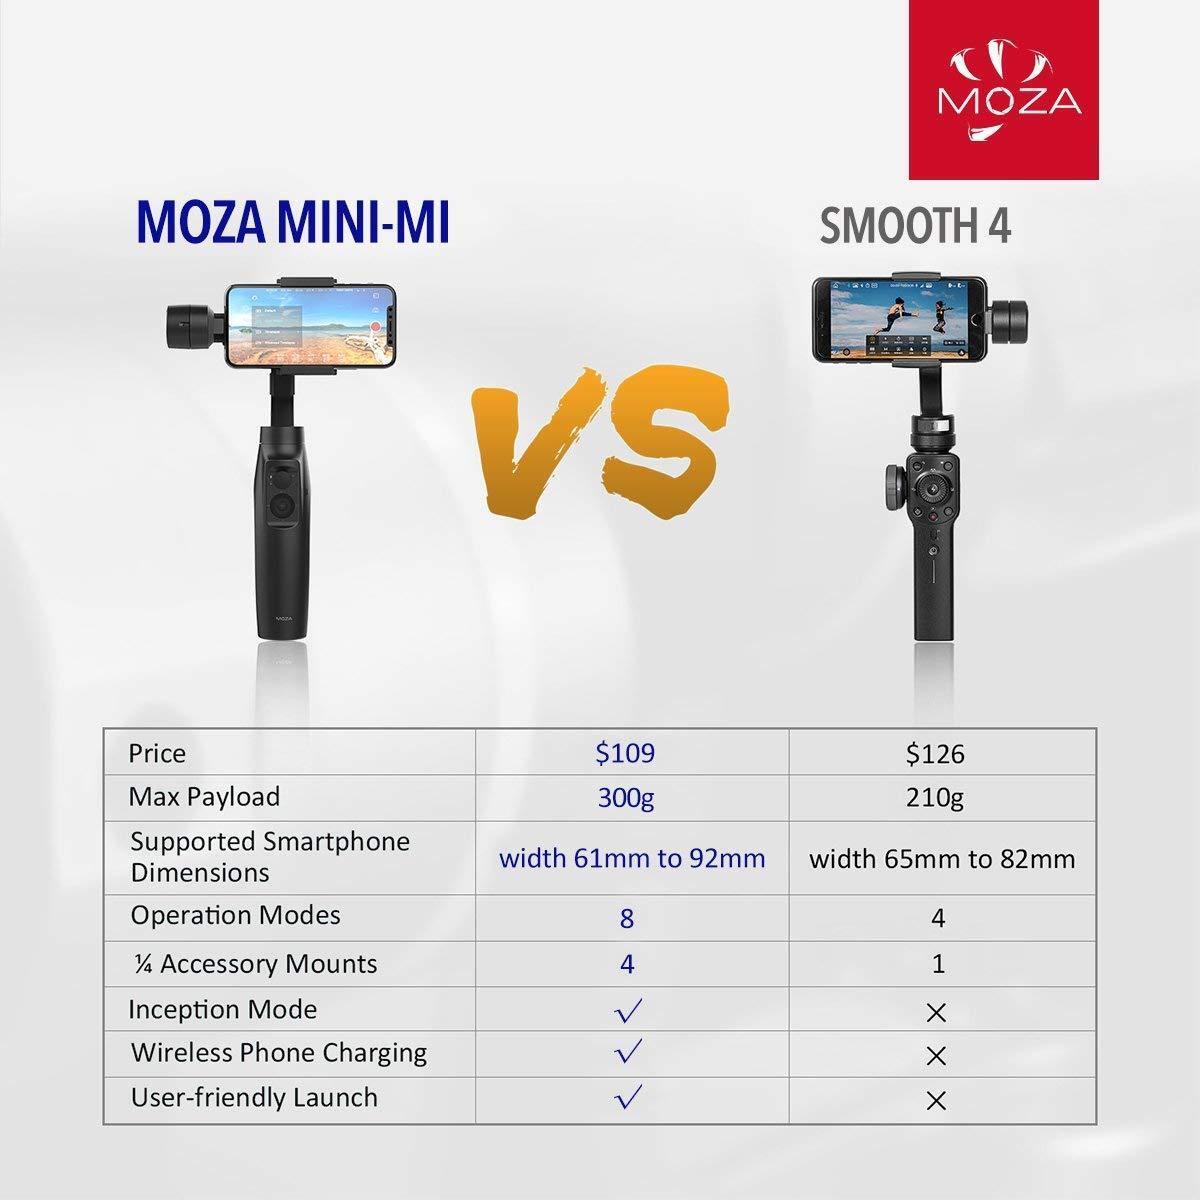 Zhiyun Smooth 4/Q Killer MOZA Mini-MI 3 Axis Smartphone Gimbal Stabilizer